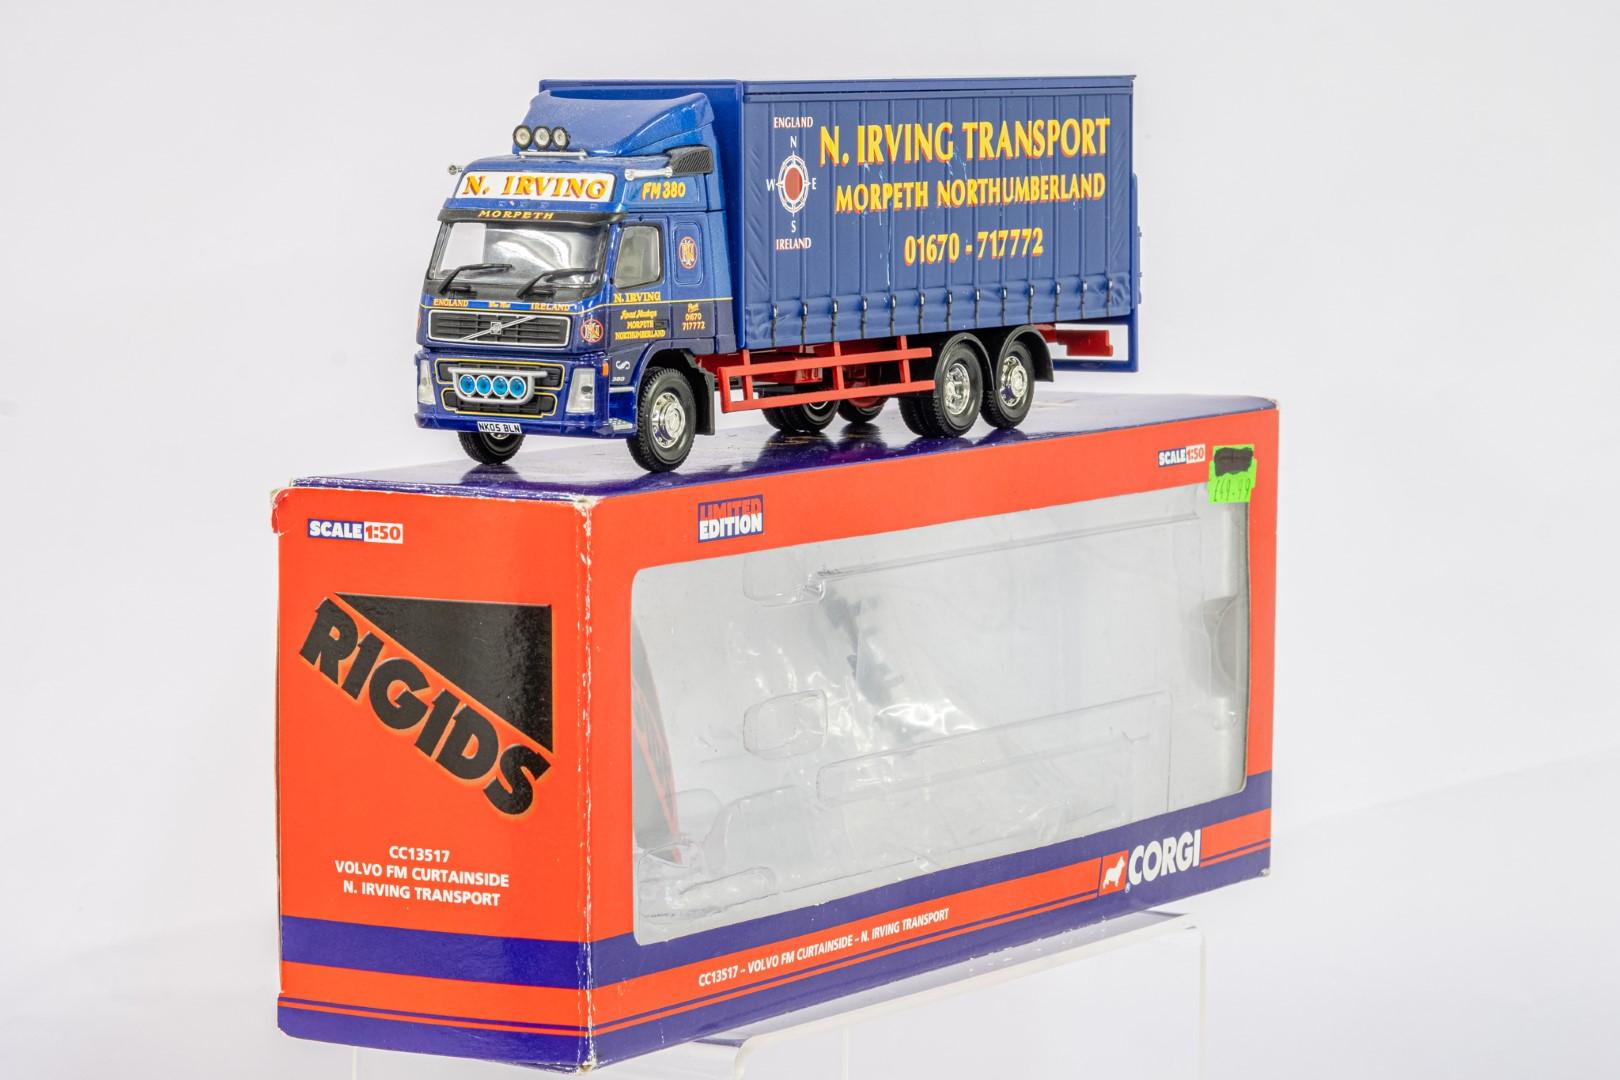 Corgi Volvo FM Curtainside - N.Irving Transport - - Image 2 of 5